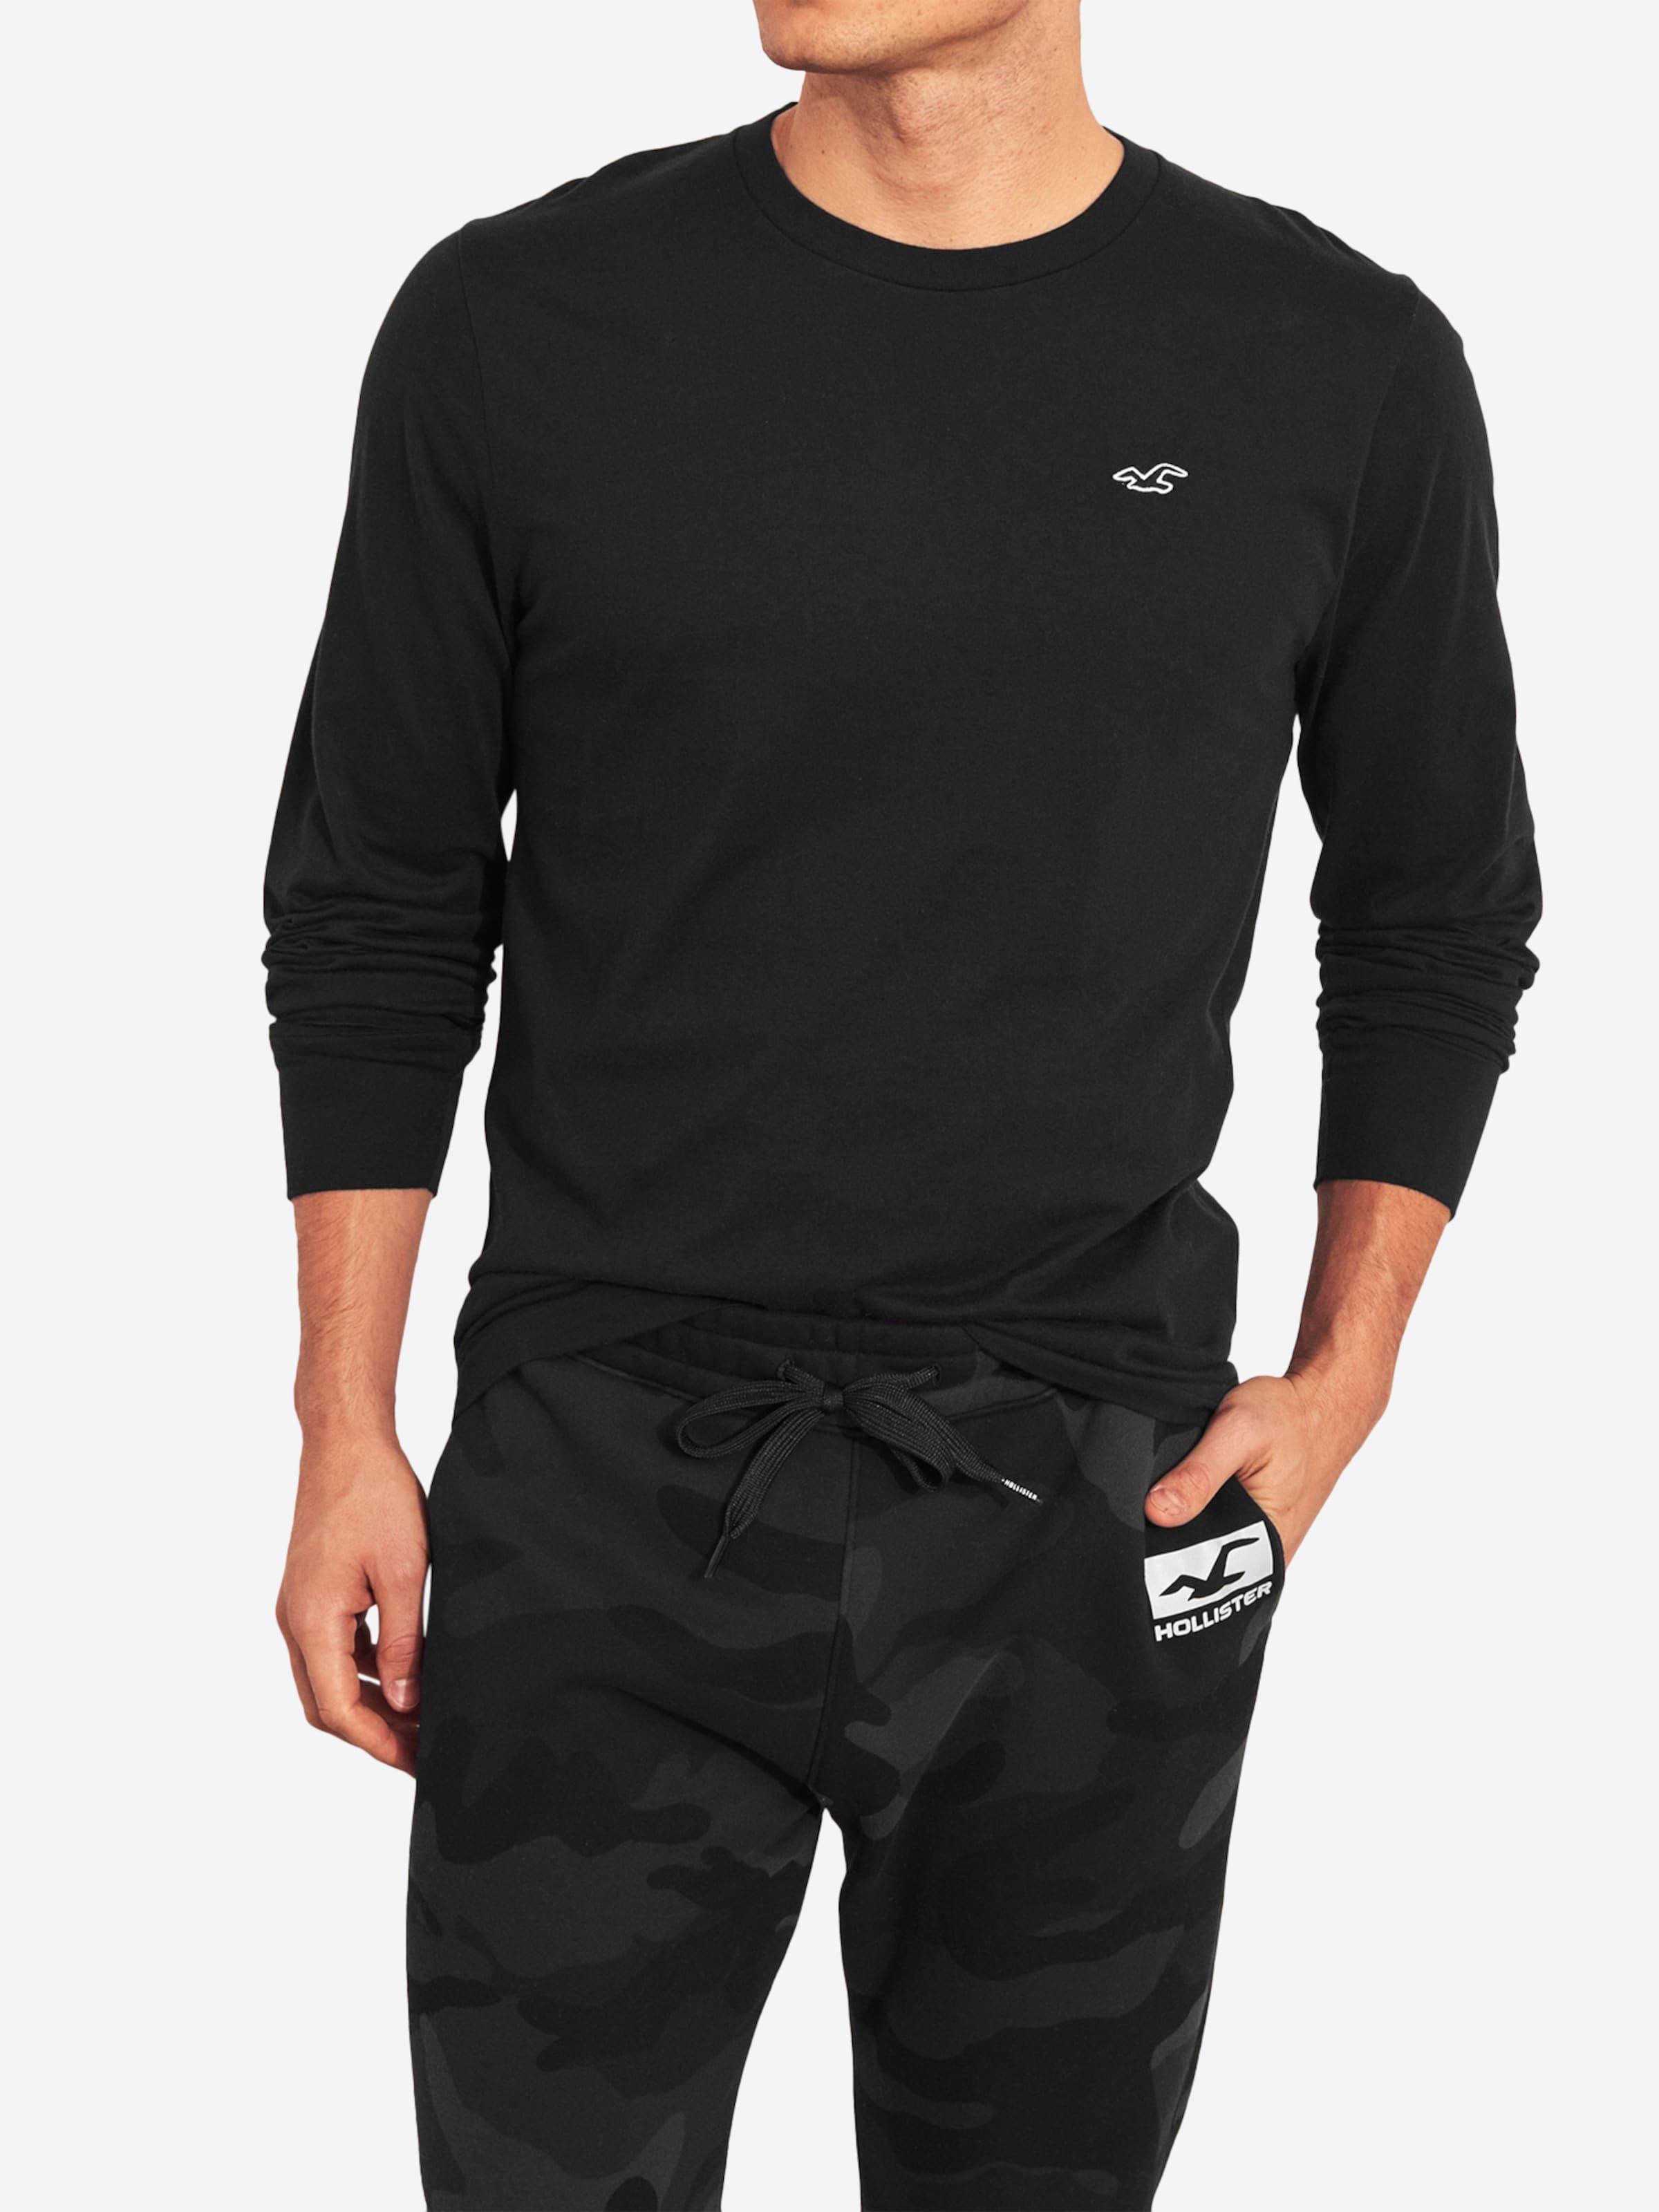 'bts19 Straight 6cc' In Schwarz Shirt mh Ls Hollister Crew Hem BerdCox